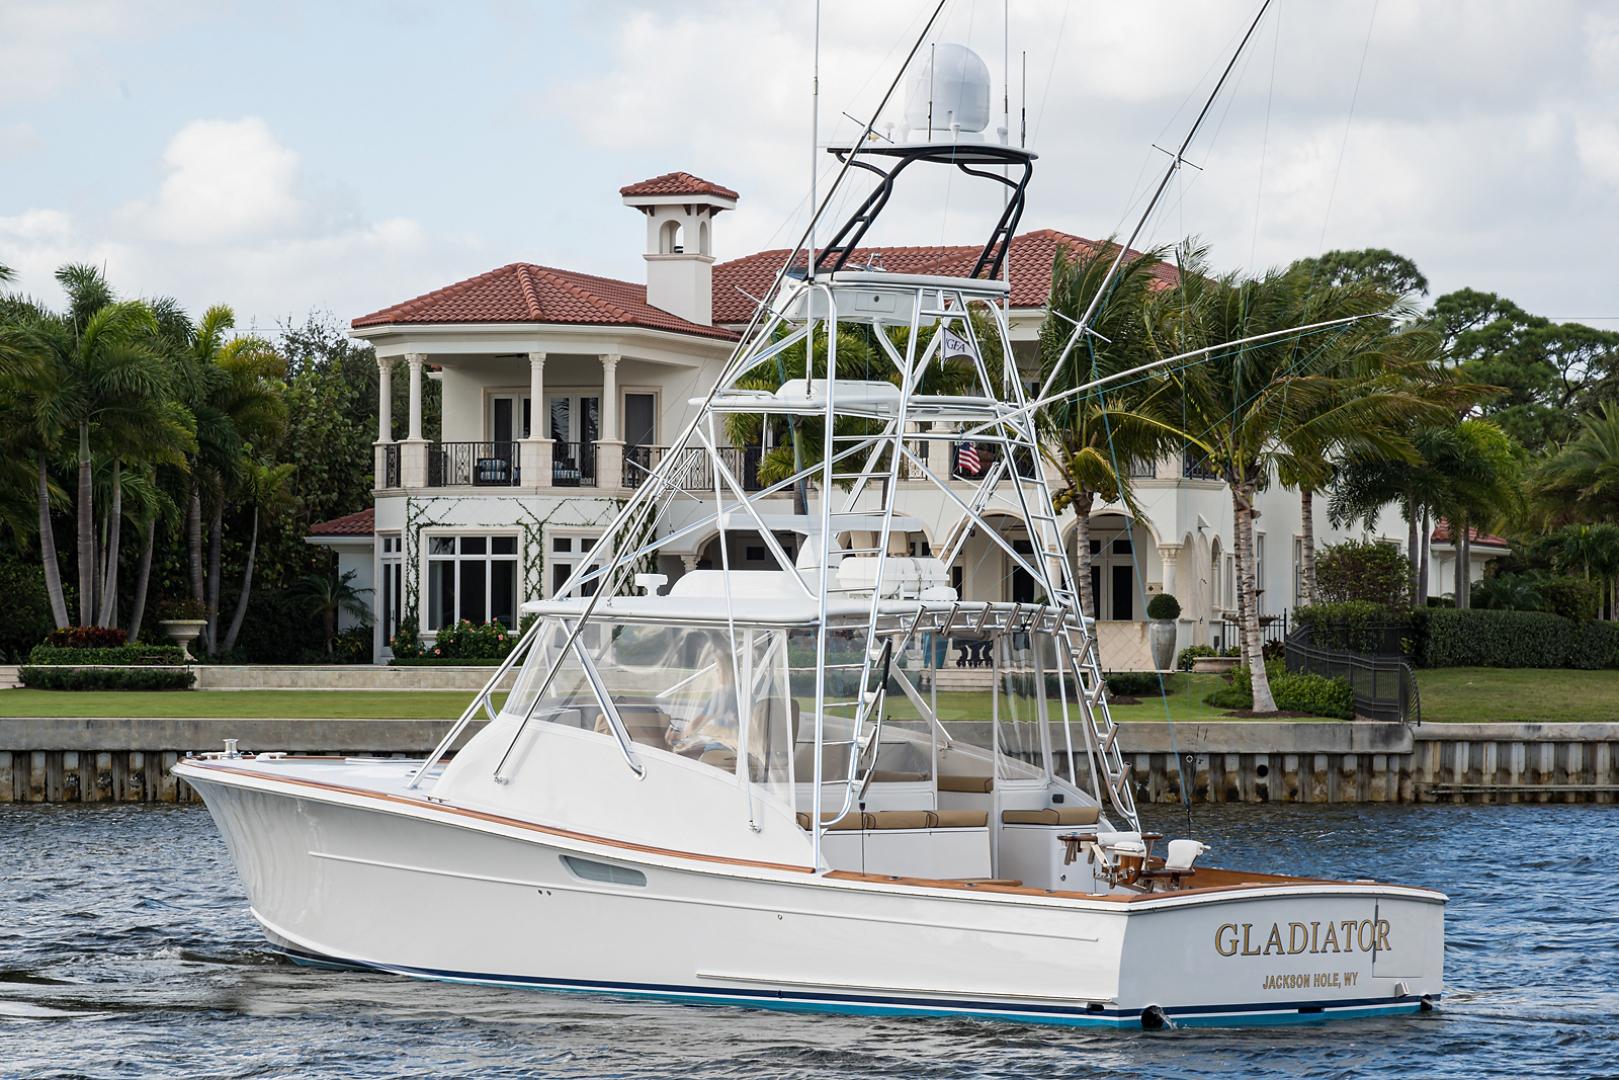 Release-One-of-A-Kind Custom Express 2014-Gladiator Jupiter-Florida-United States-Gladiator-1370146   Thumbnail